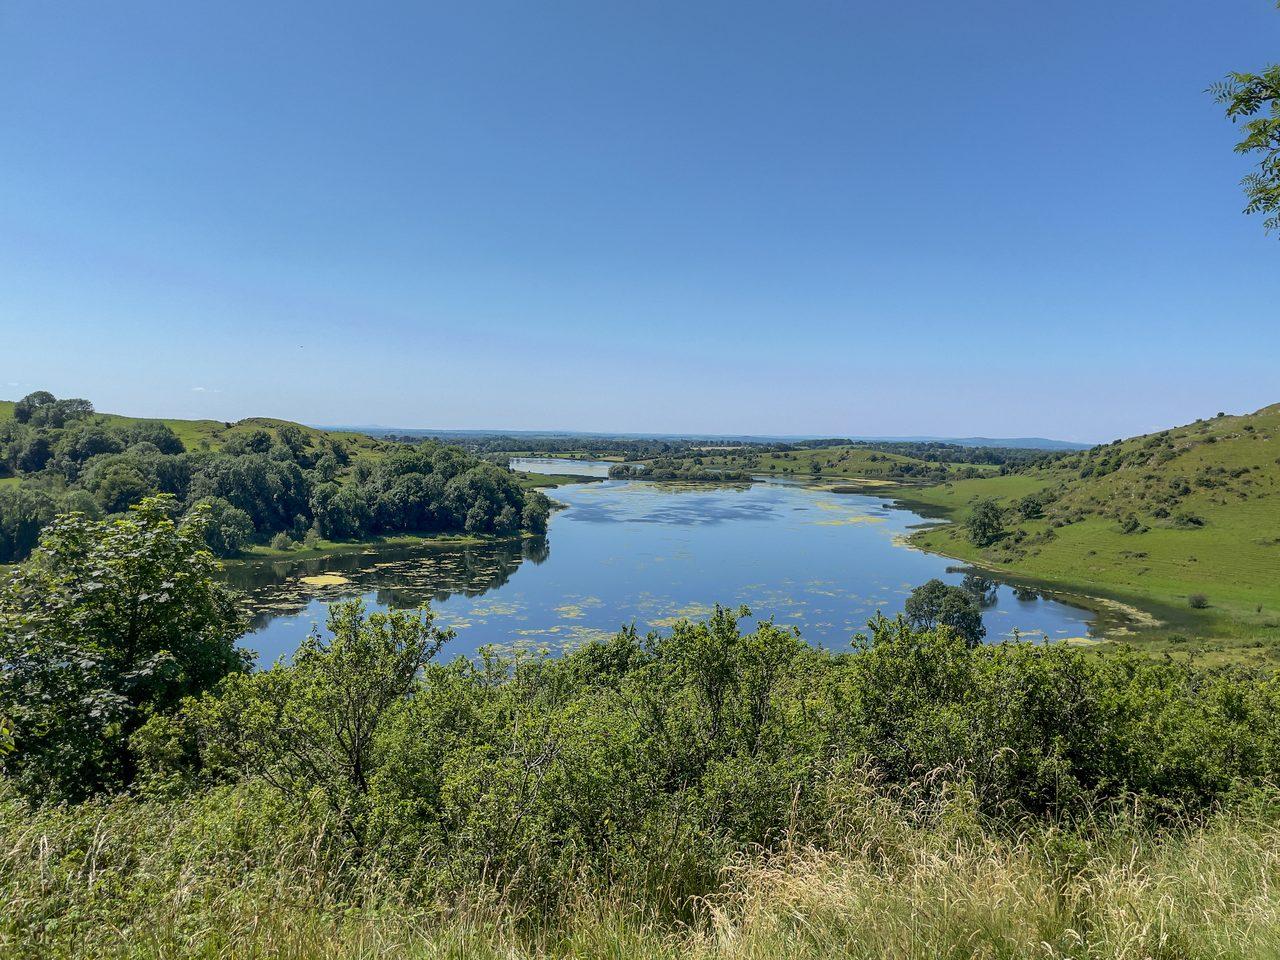 Fluvial landforms of streams, Plant community, Natural landscape, Lacustrine plain, Sky, Water, Tree, Watercourse, Lake